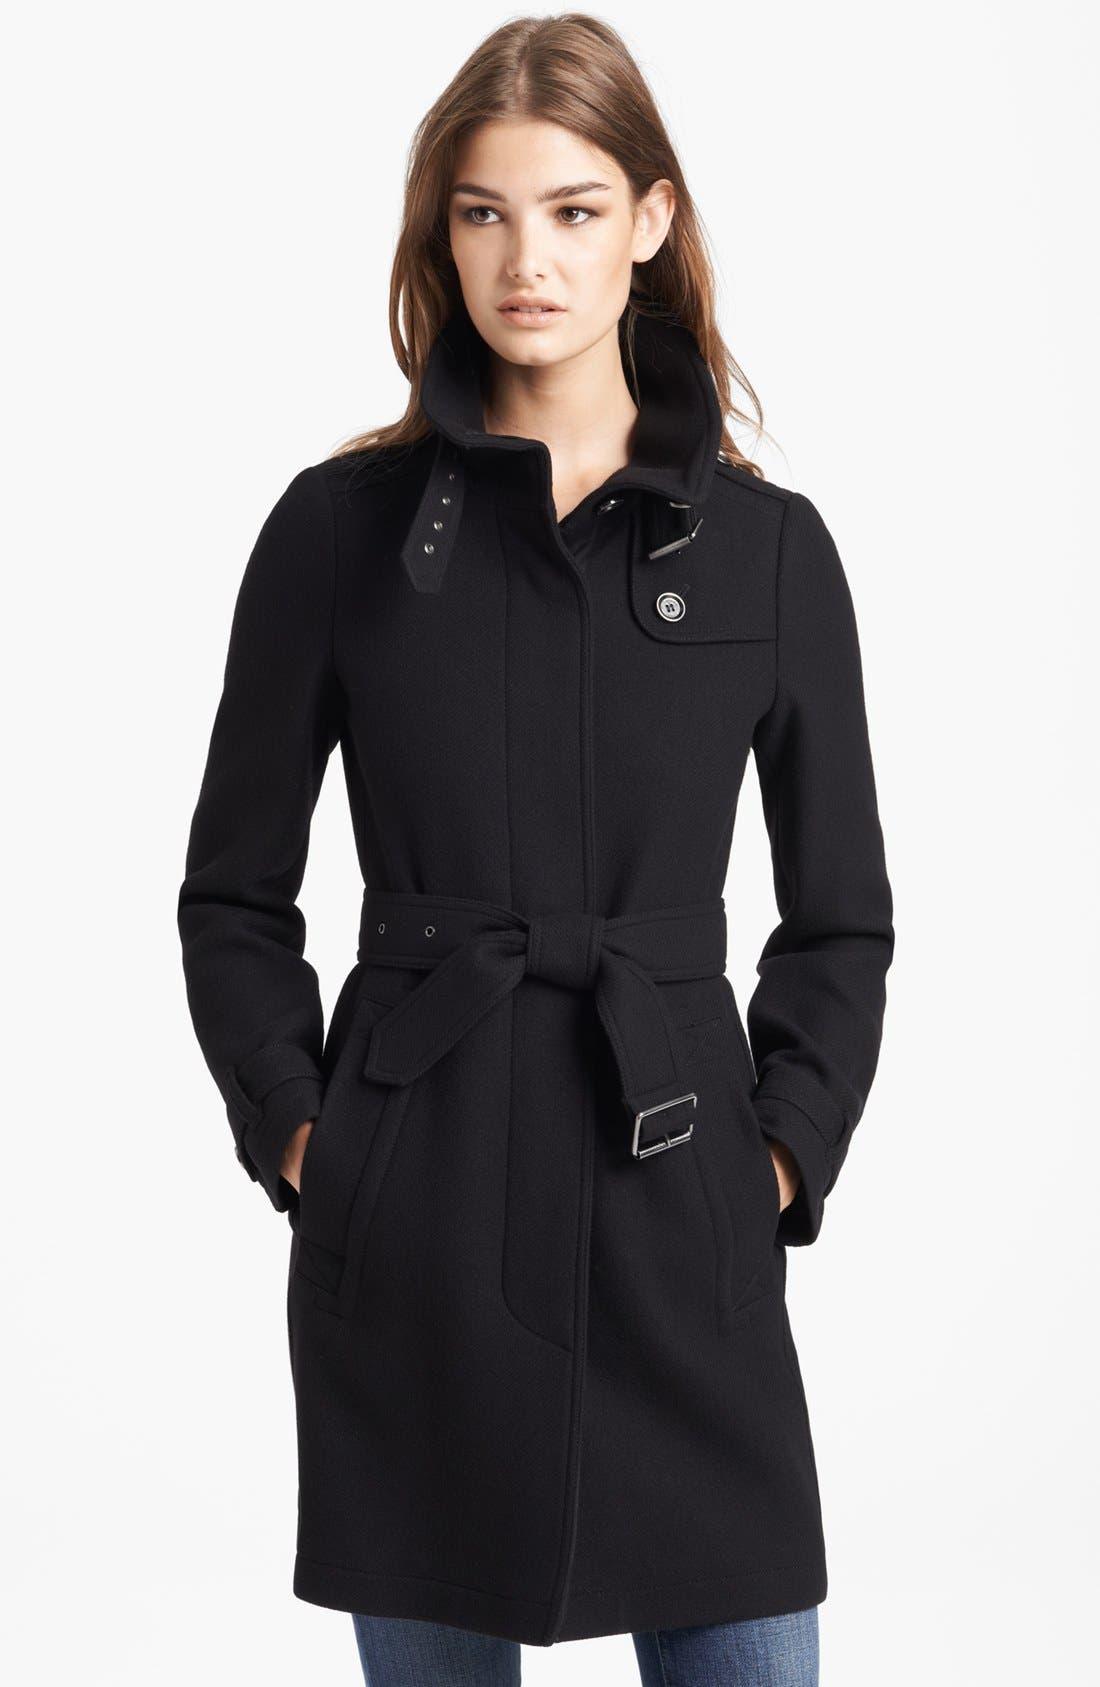 Alternate Image 1 Selected - Burberry Brit 'Rushworth' Belted Wool Blend Coat